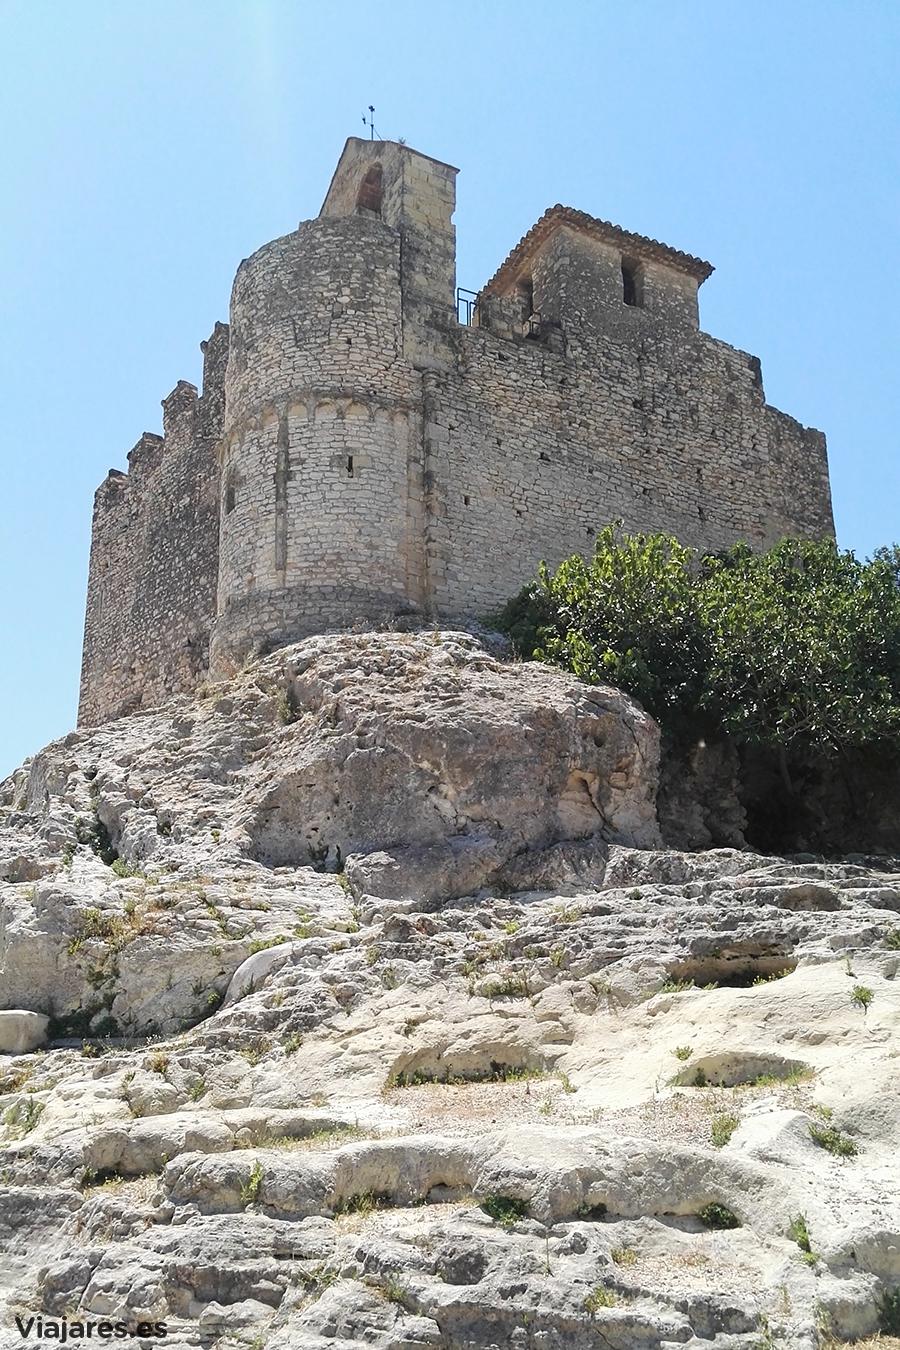 Silueta del castillo medieval de Calafell